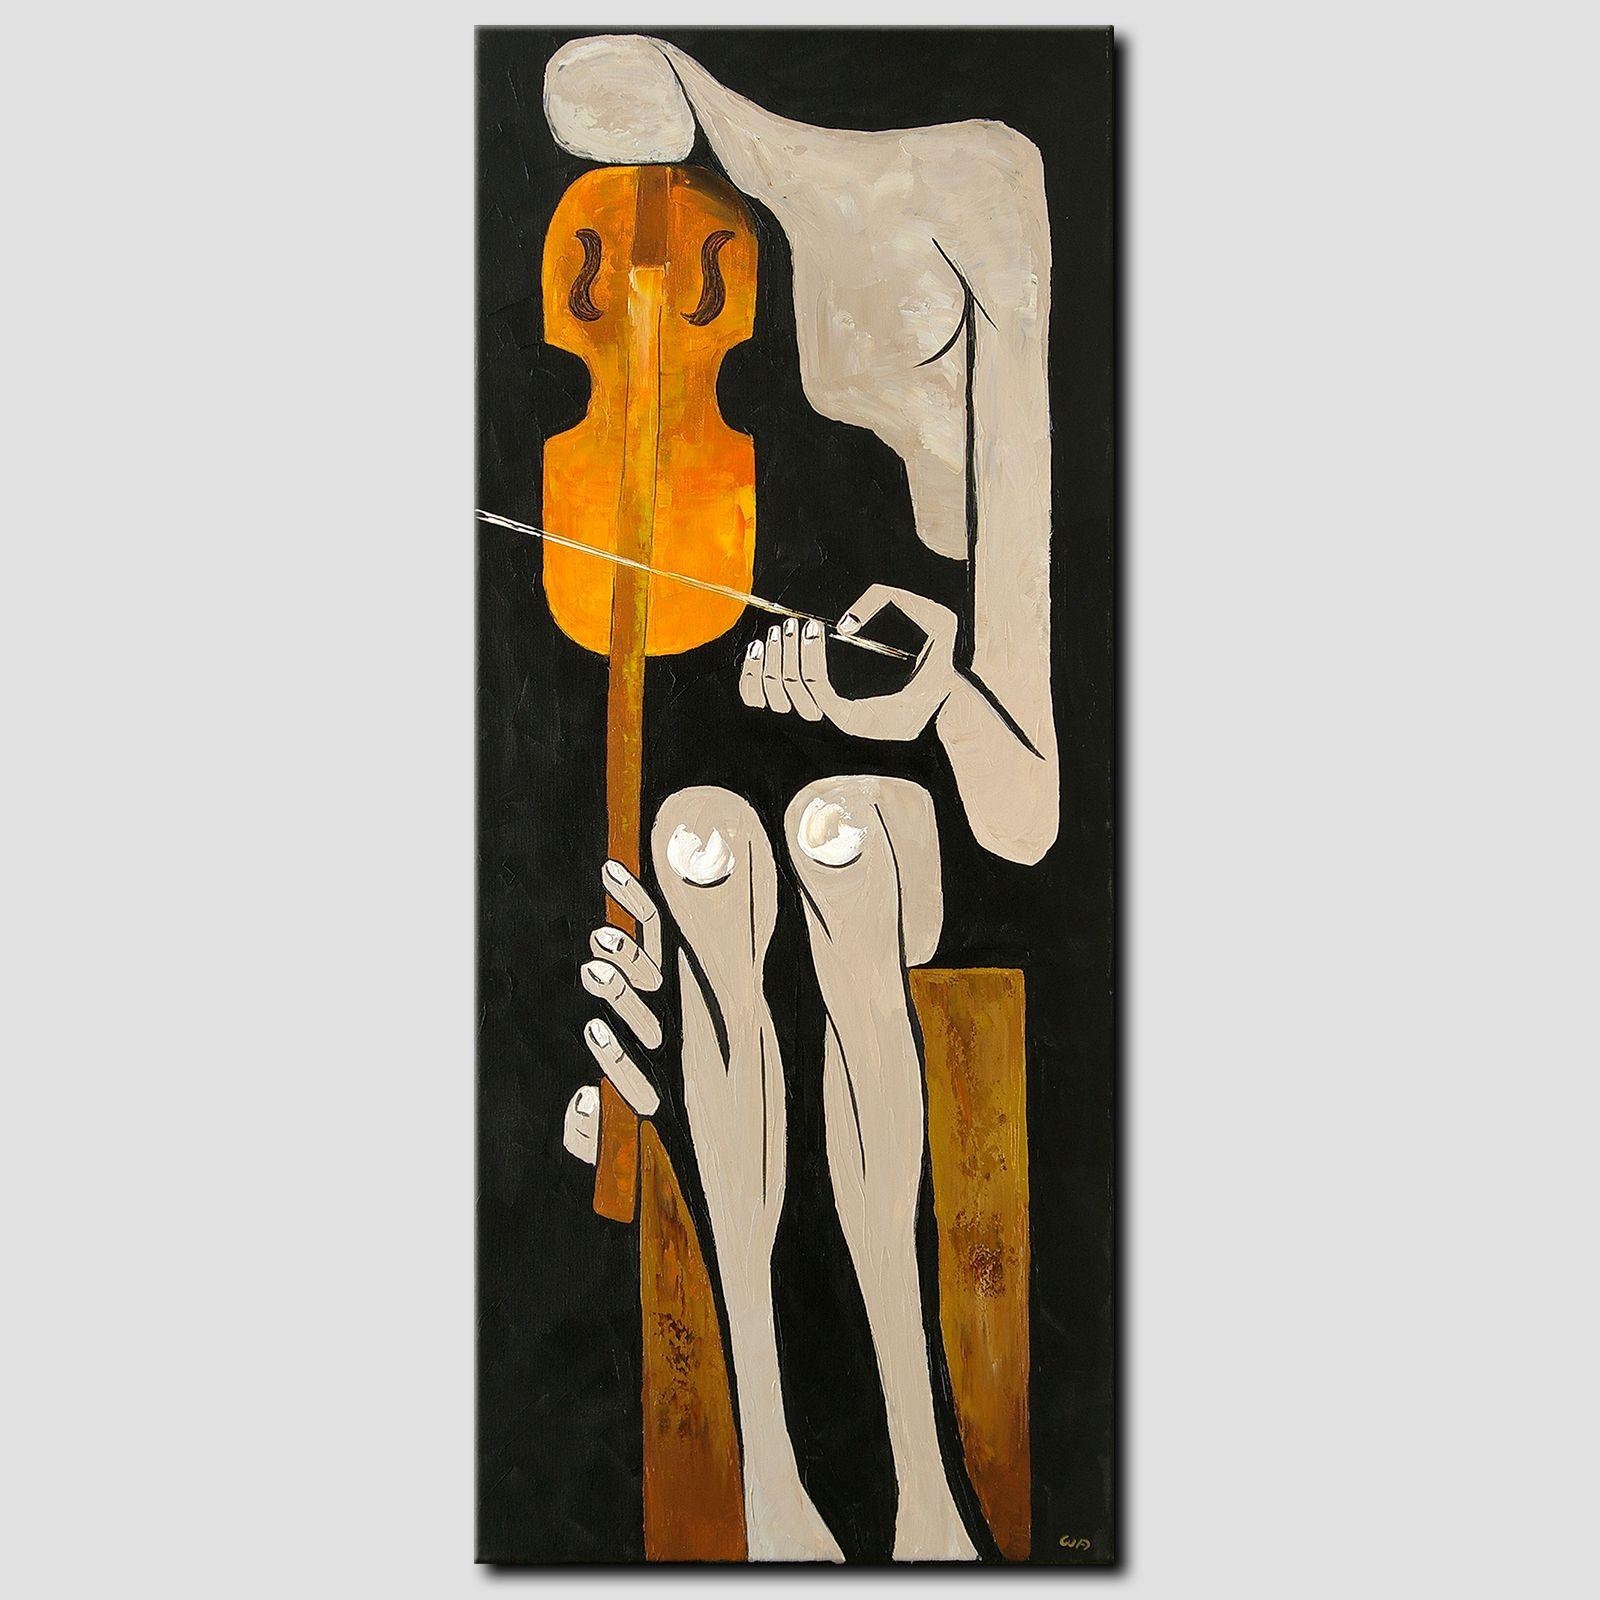 Novaarte Gemälde Acryl Kunst Malerei Original Bild Abstrakt Mann Geige Musiker Art Modern Handgemalt Acryl Kunst Gemälde Acryl Dekorative Gemälde